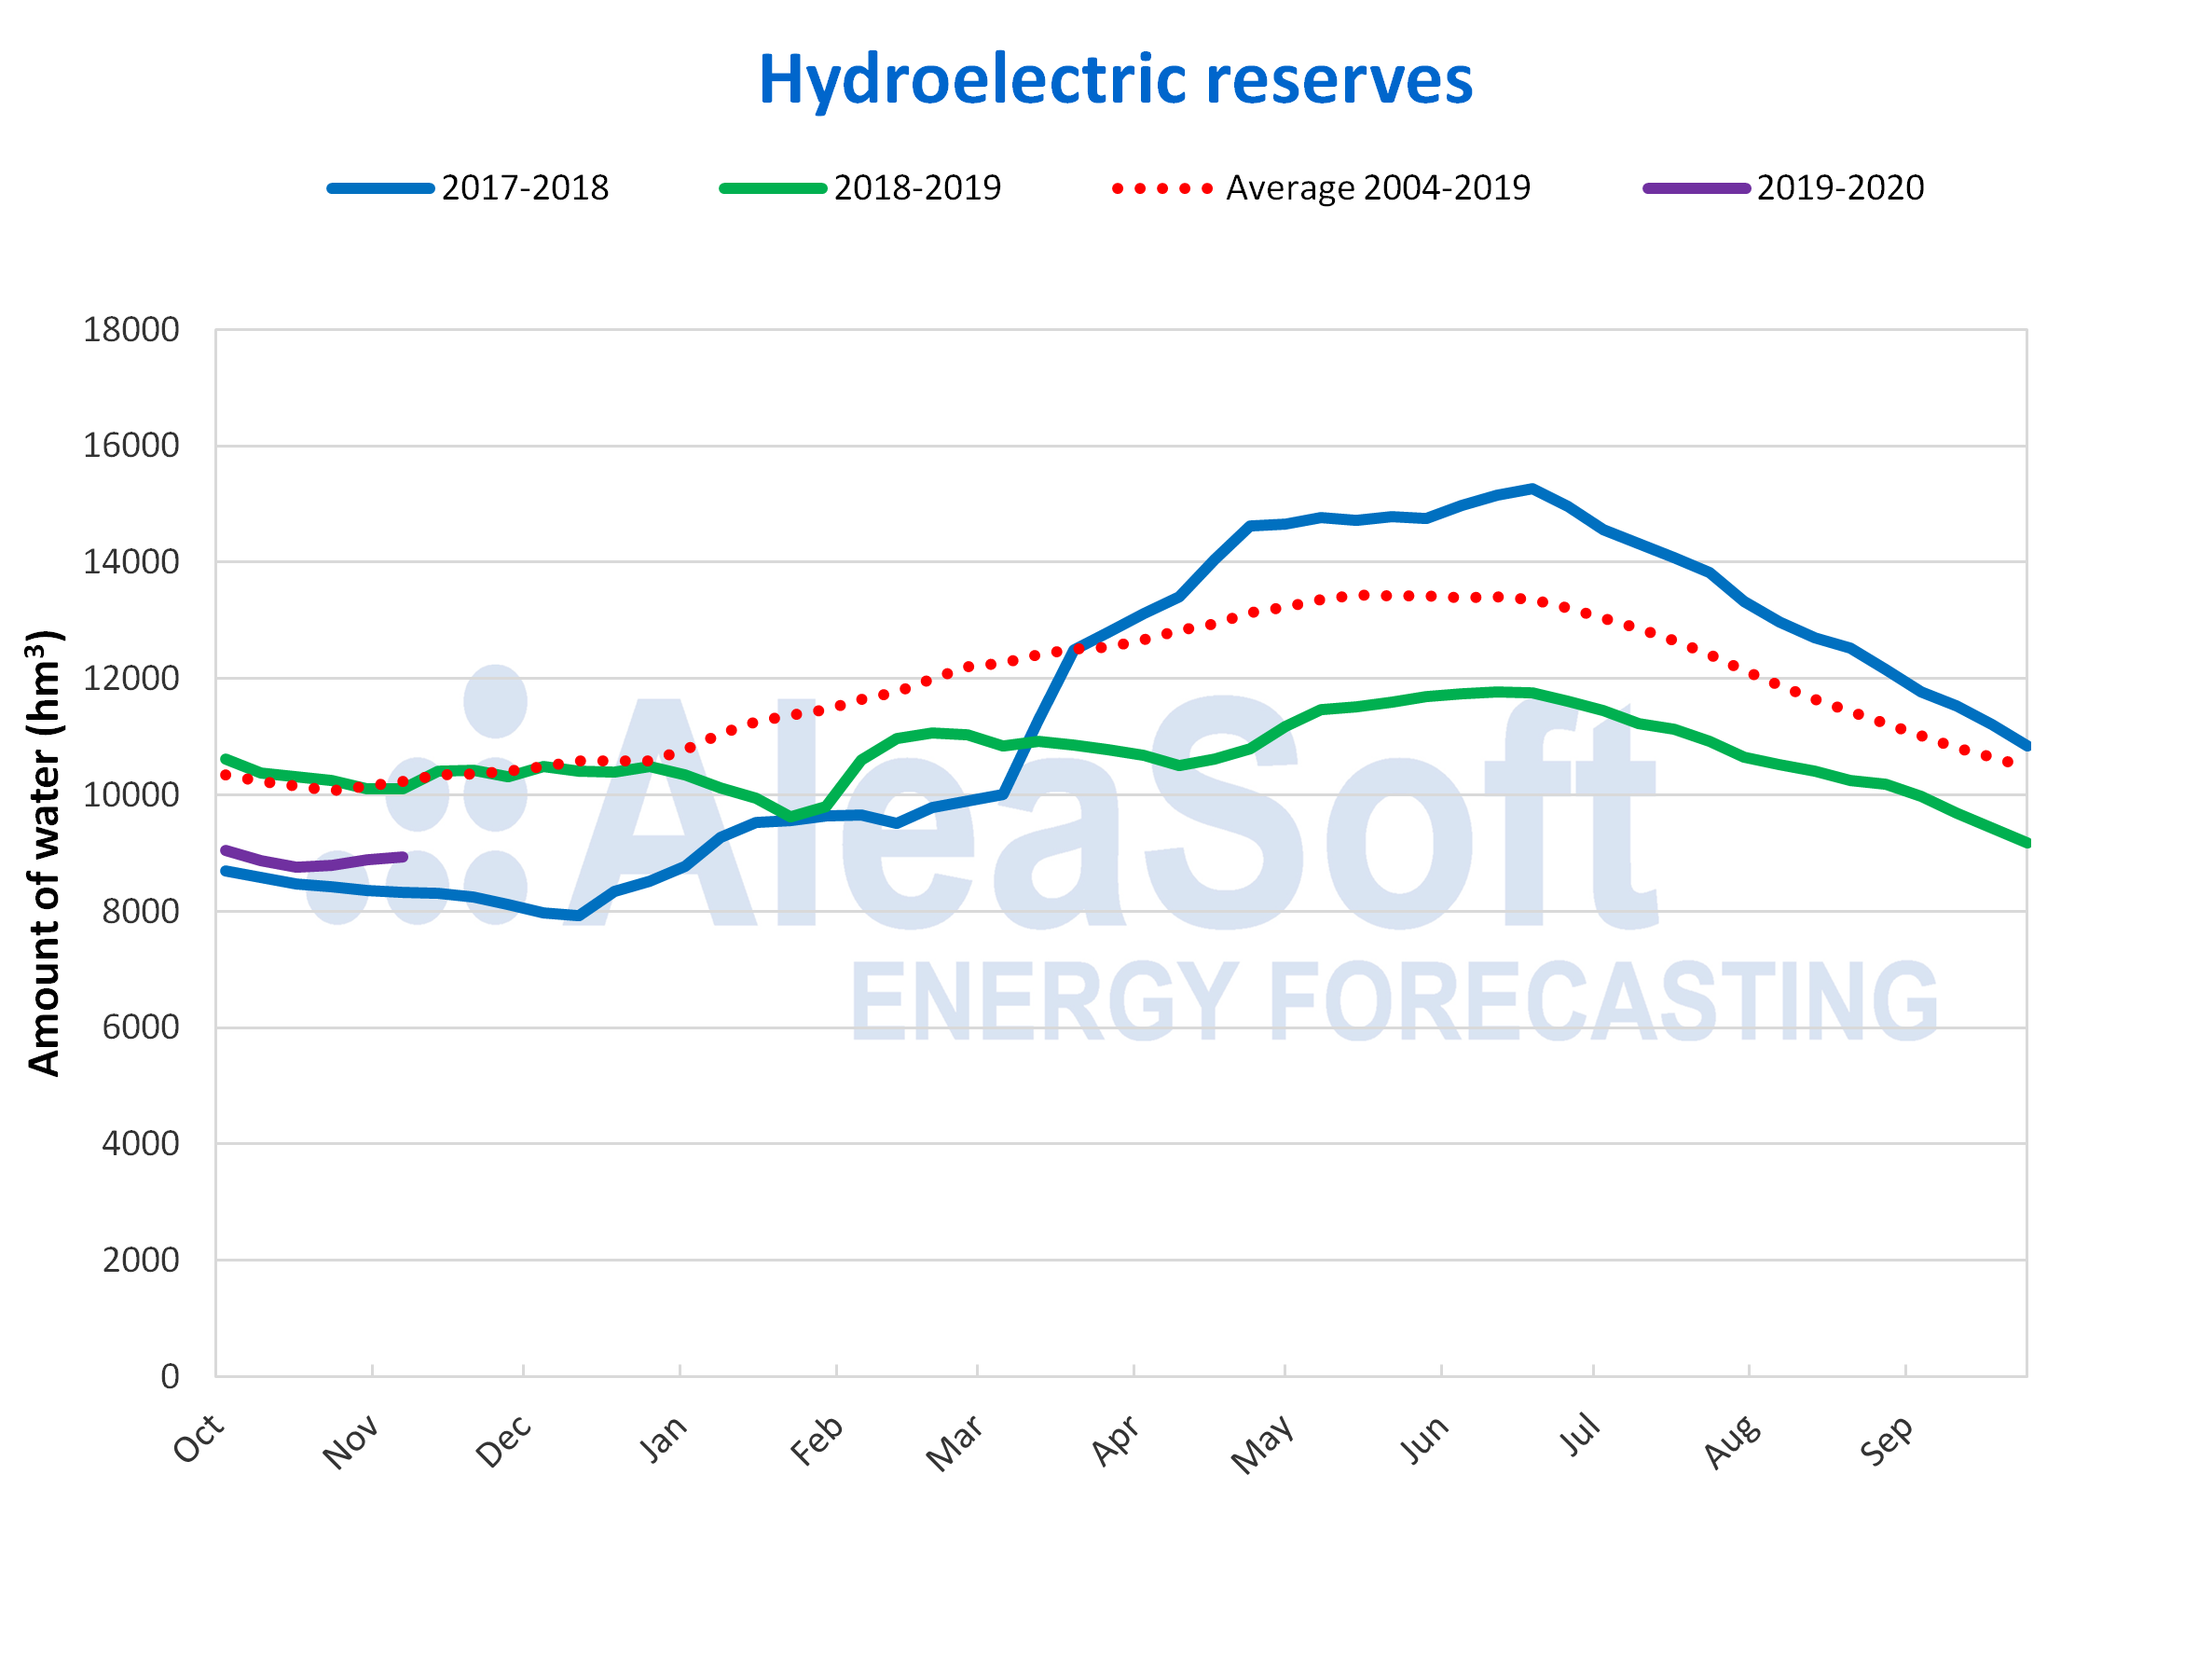 AleaSoft - Hydroelectric reserves Spain